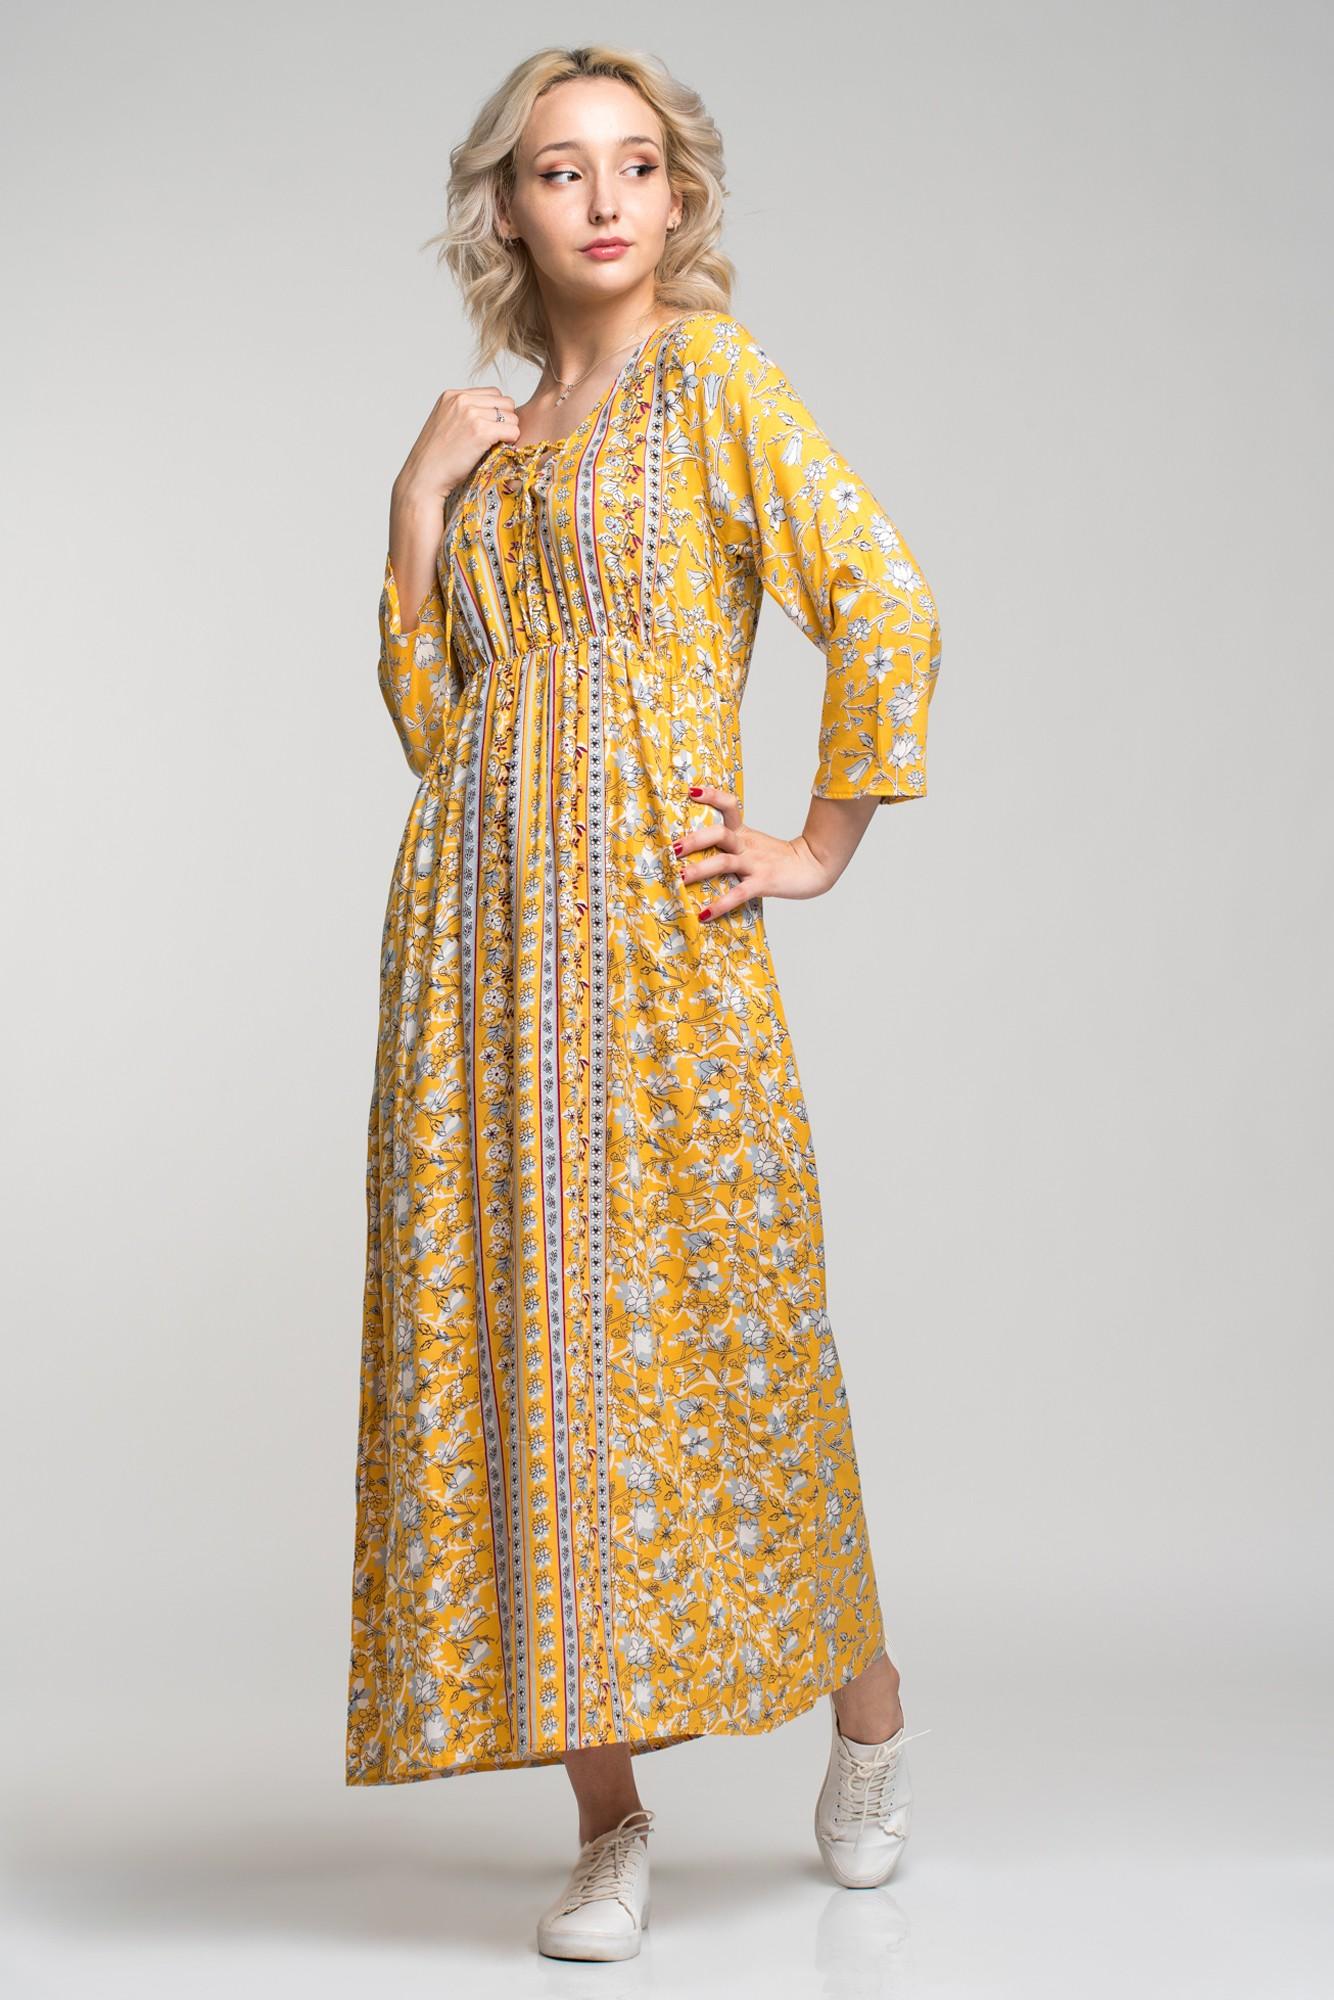 Rochie boho-chic lunga din vascoza cu imprimeu galben Angy